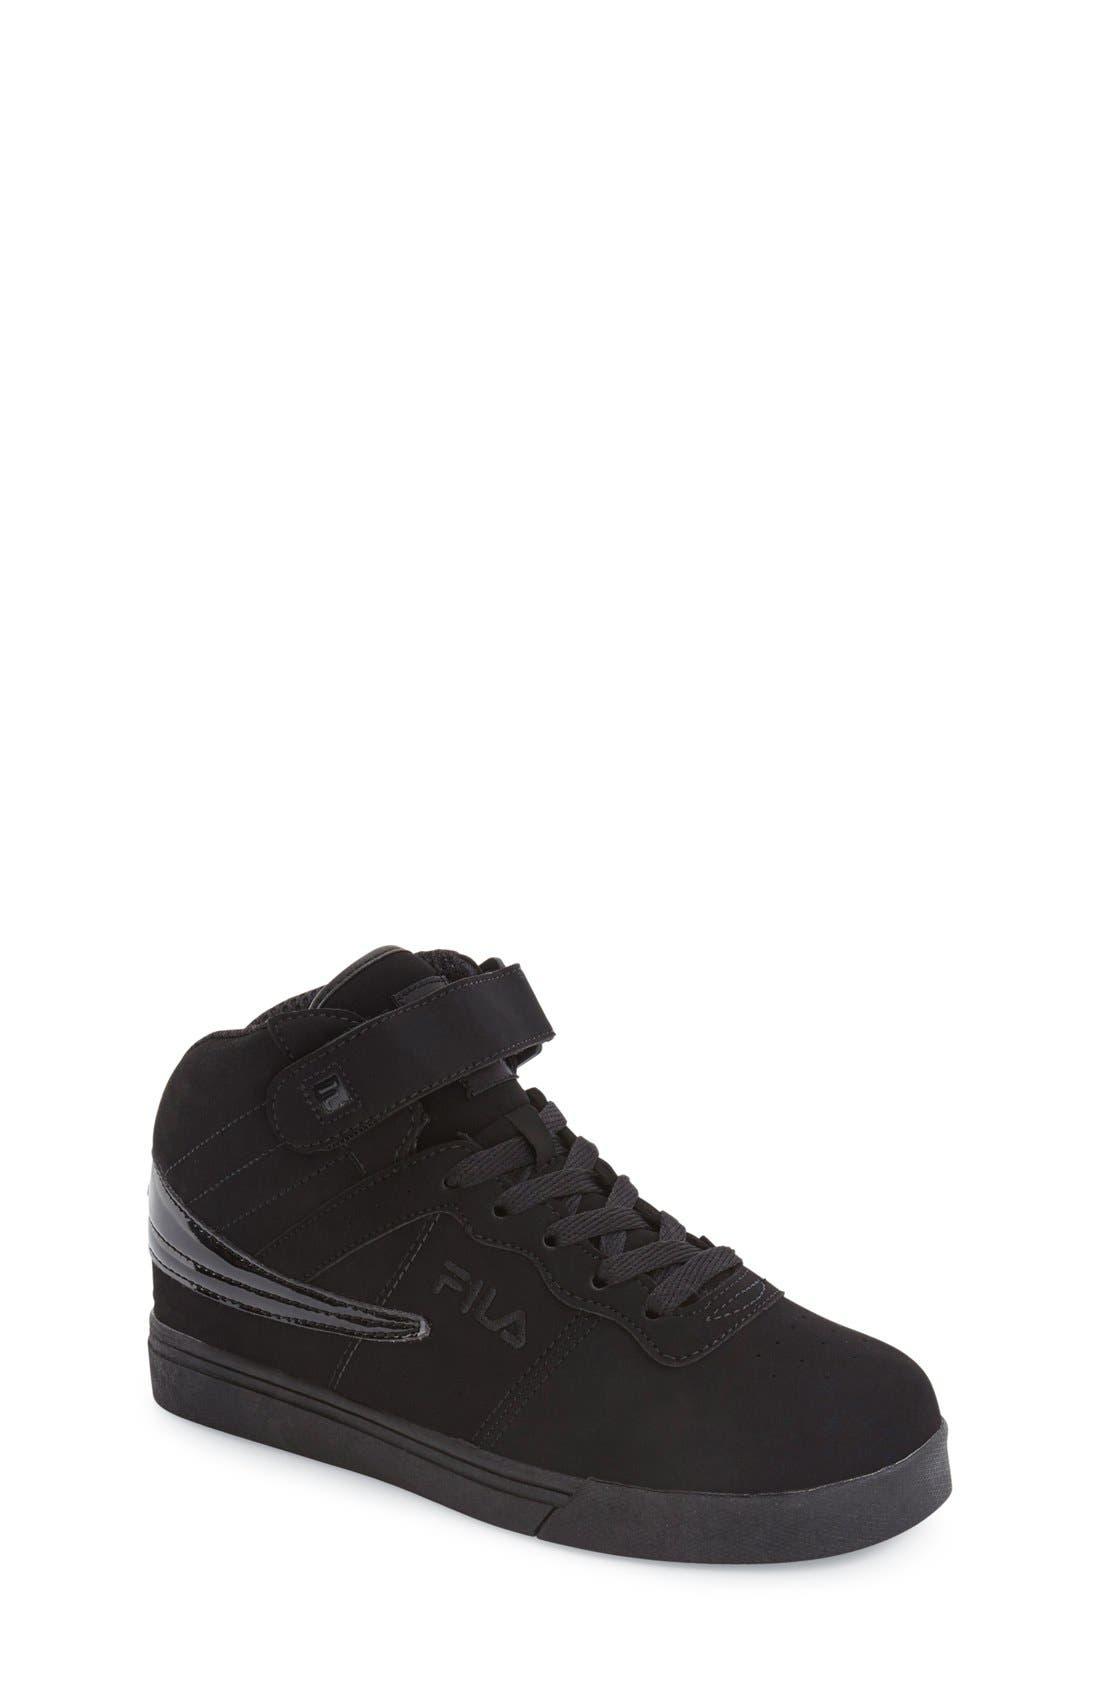 FILA Vulc 13 High Top Sneaker